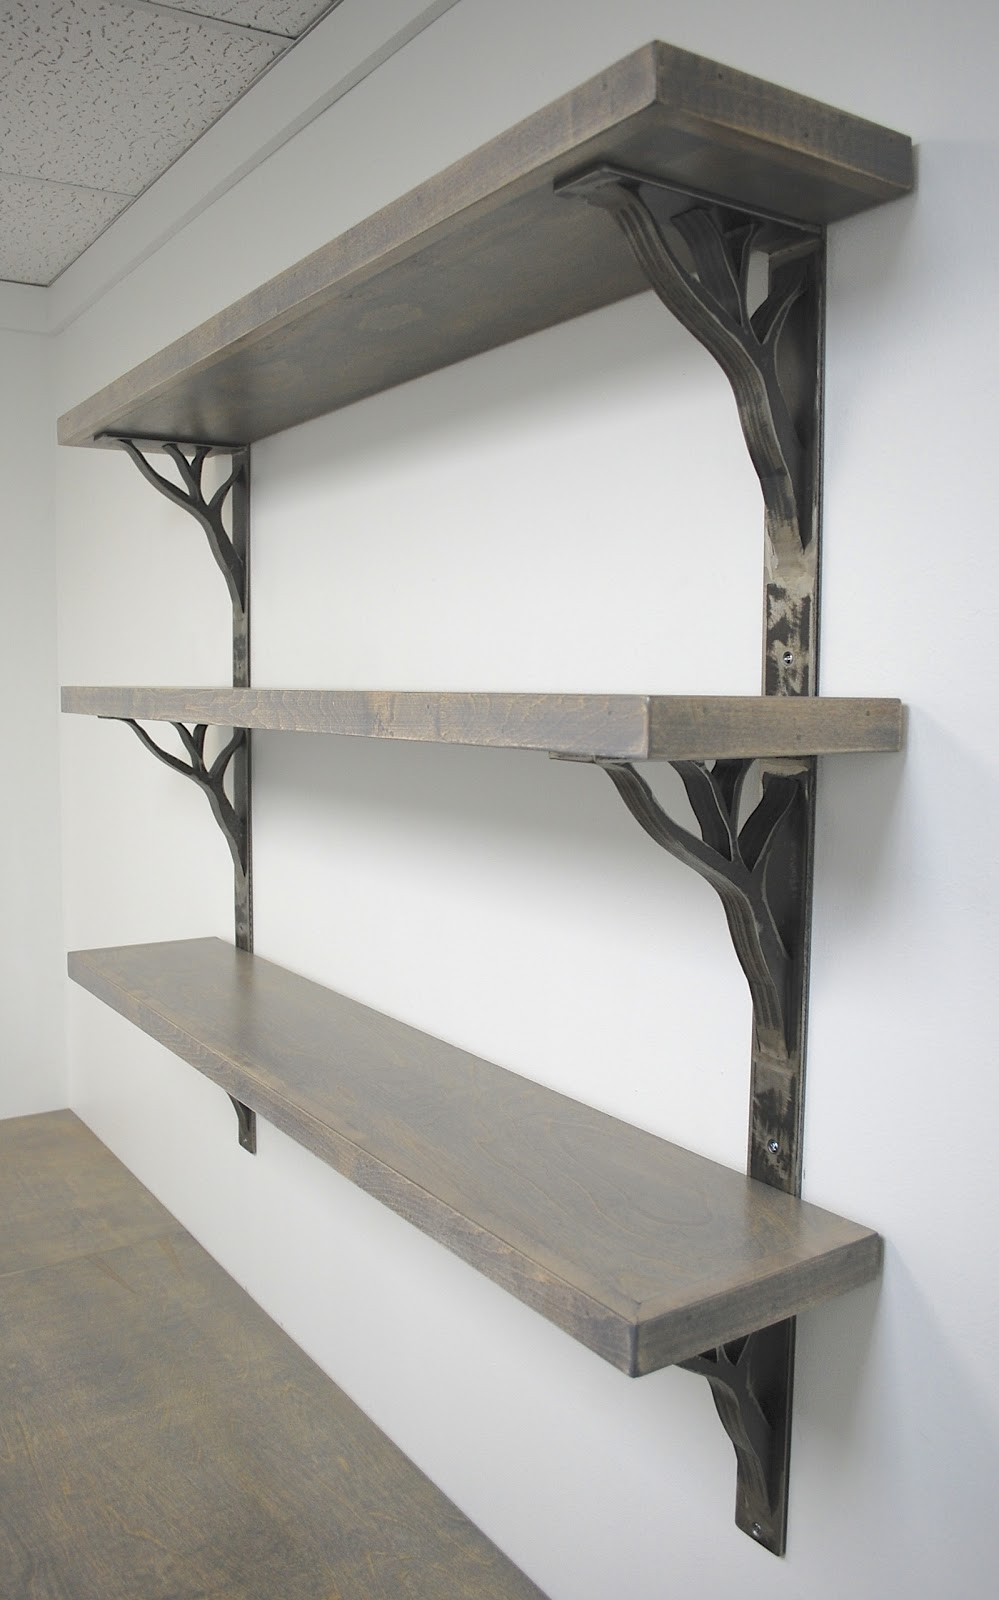 Architectural Supports Shelves : Urban ironcraft open shelving linear shelf brackets